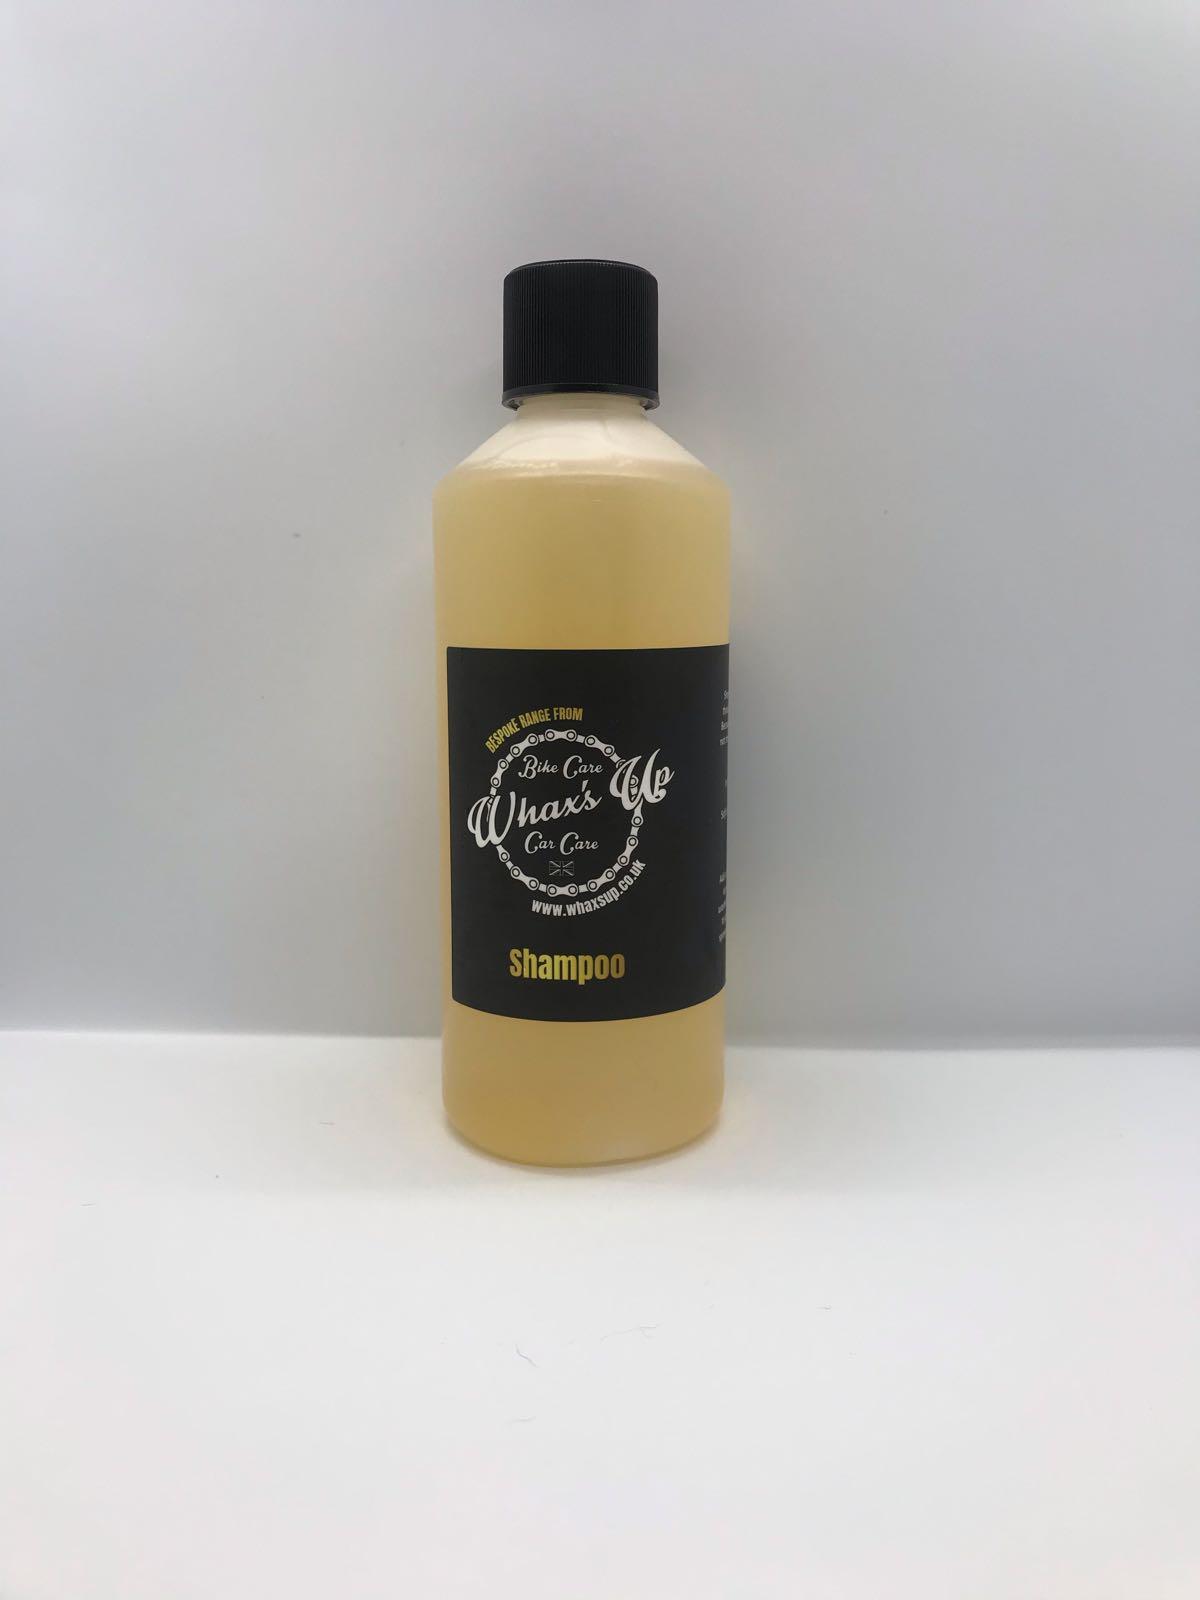 c. Shampoo 500 ml